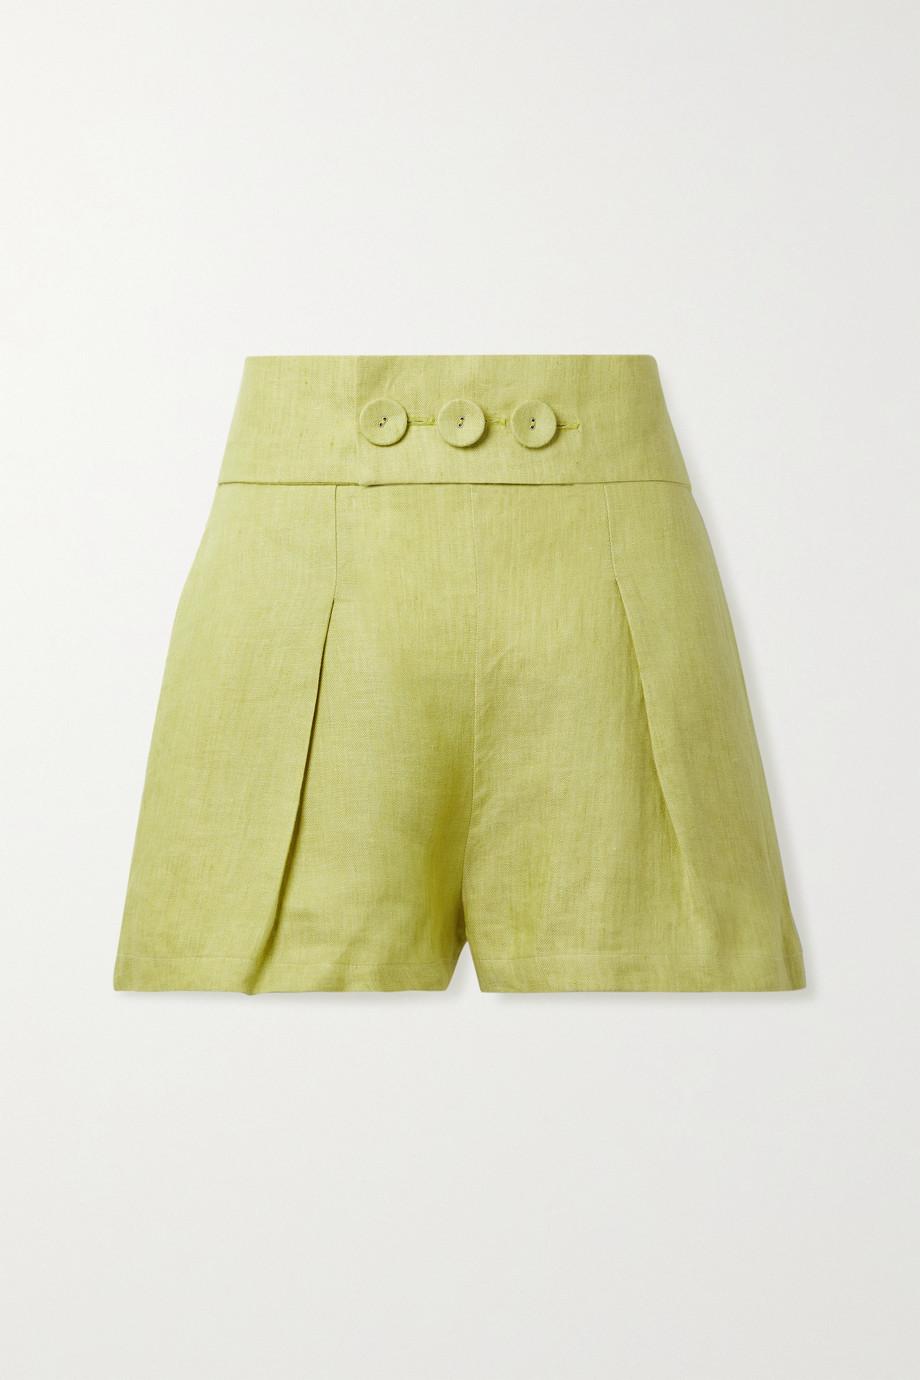 BONDI BORN Millicent belted linen shorts